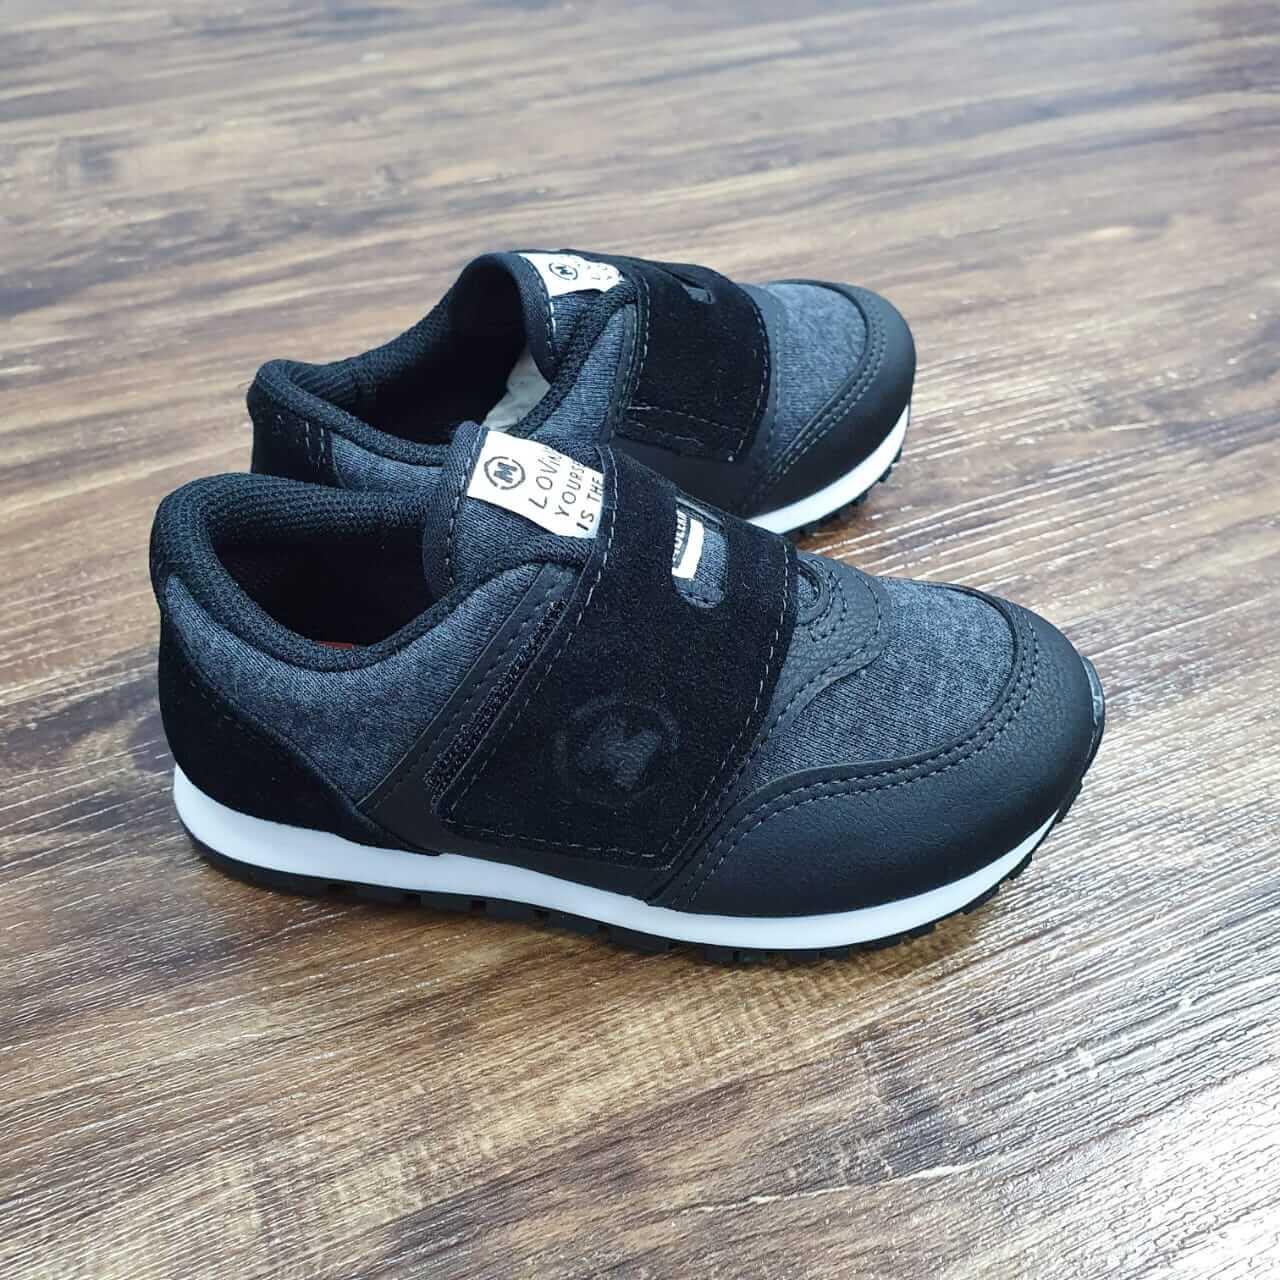 Tênis de Velcro Preto Camurça Infantil